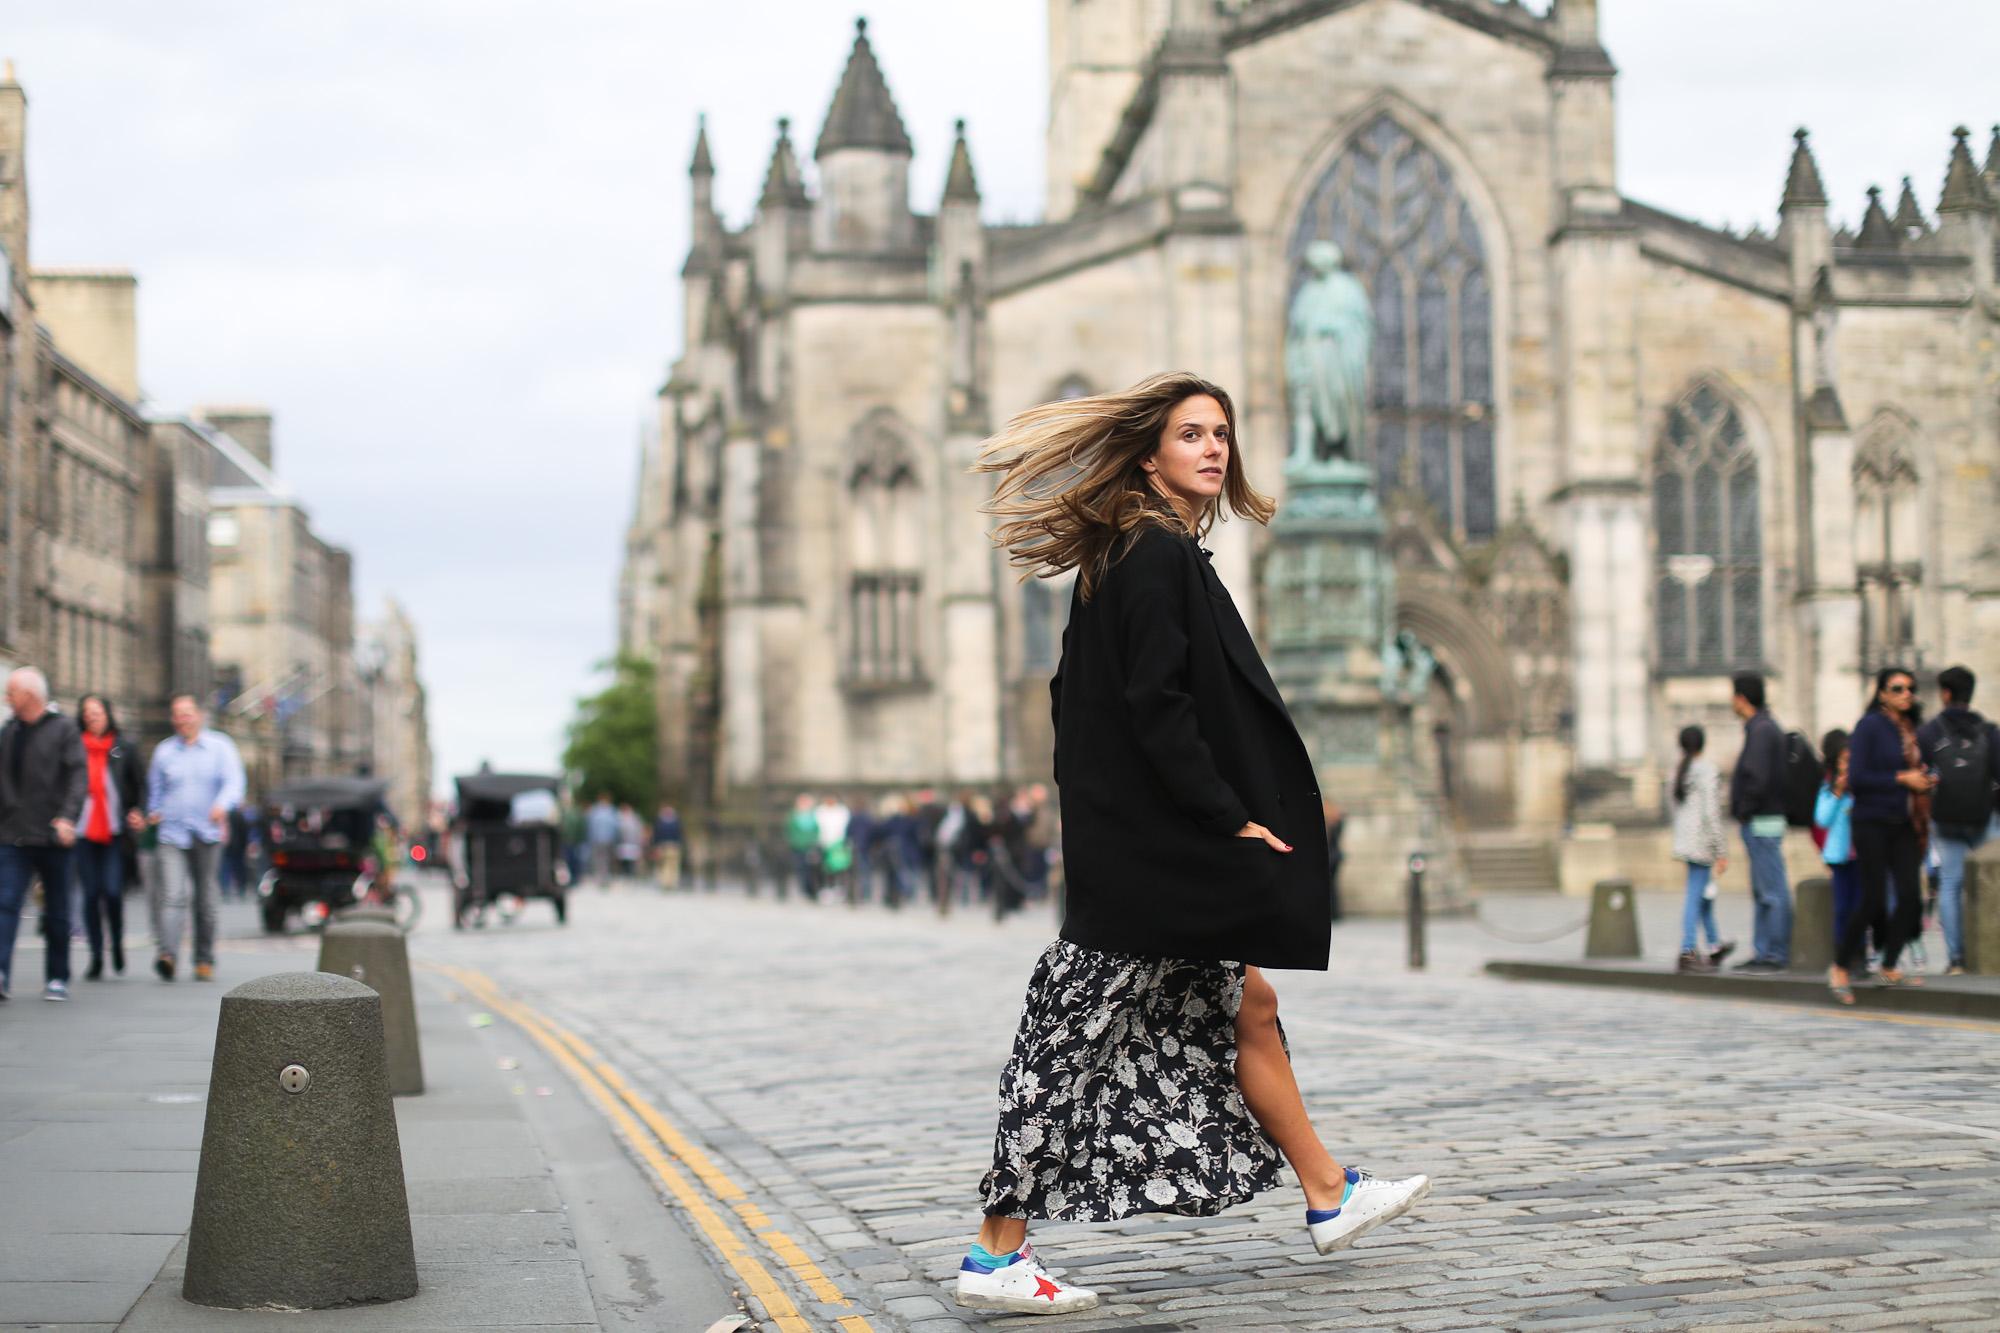 Clochet_streetstyle_edinburgh_igerswindtrip_escociamola_zaralongflowerprintdress_goldengoosedeluxe_sneakers